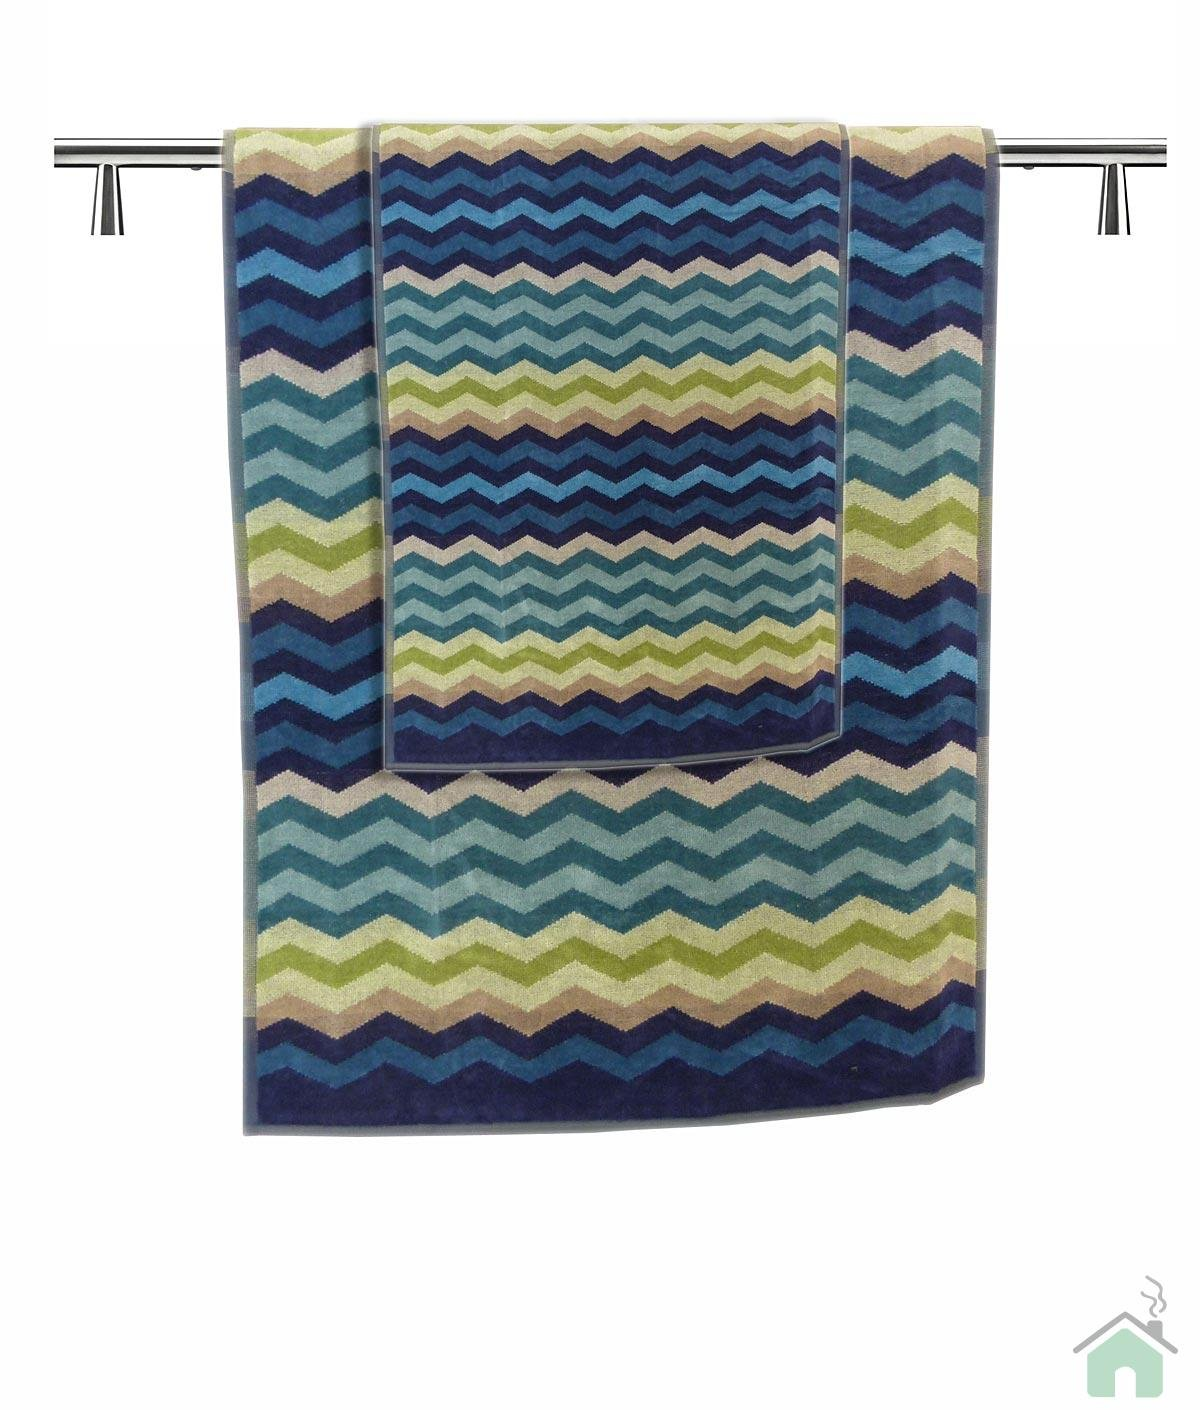 Towels set 6+6 Missoni Home Pete var.170 - zig-zag pattern